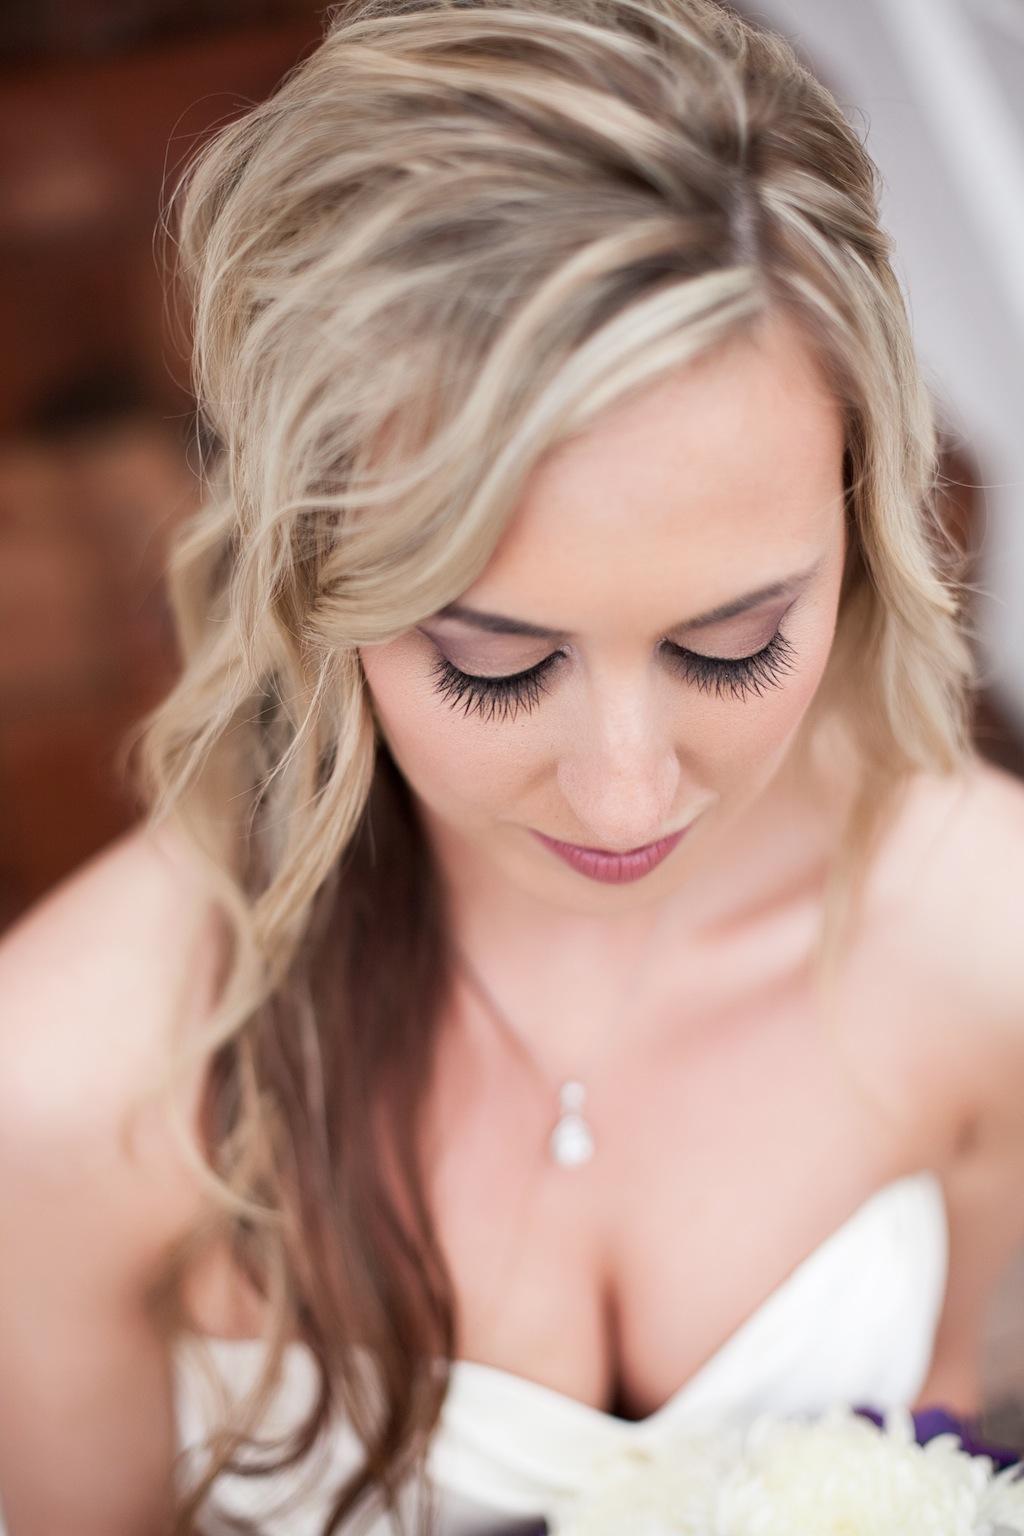 Brooksville Wedding - Purple, Silver & Ivory Wedding at Southern Hills Plantation Club - Brooksville Wedding Photographer Blue Lane Studios (18)